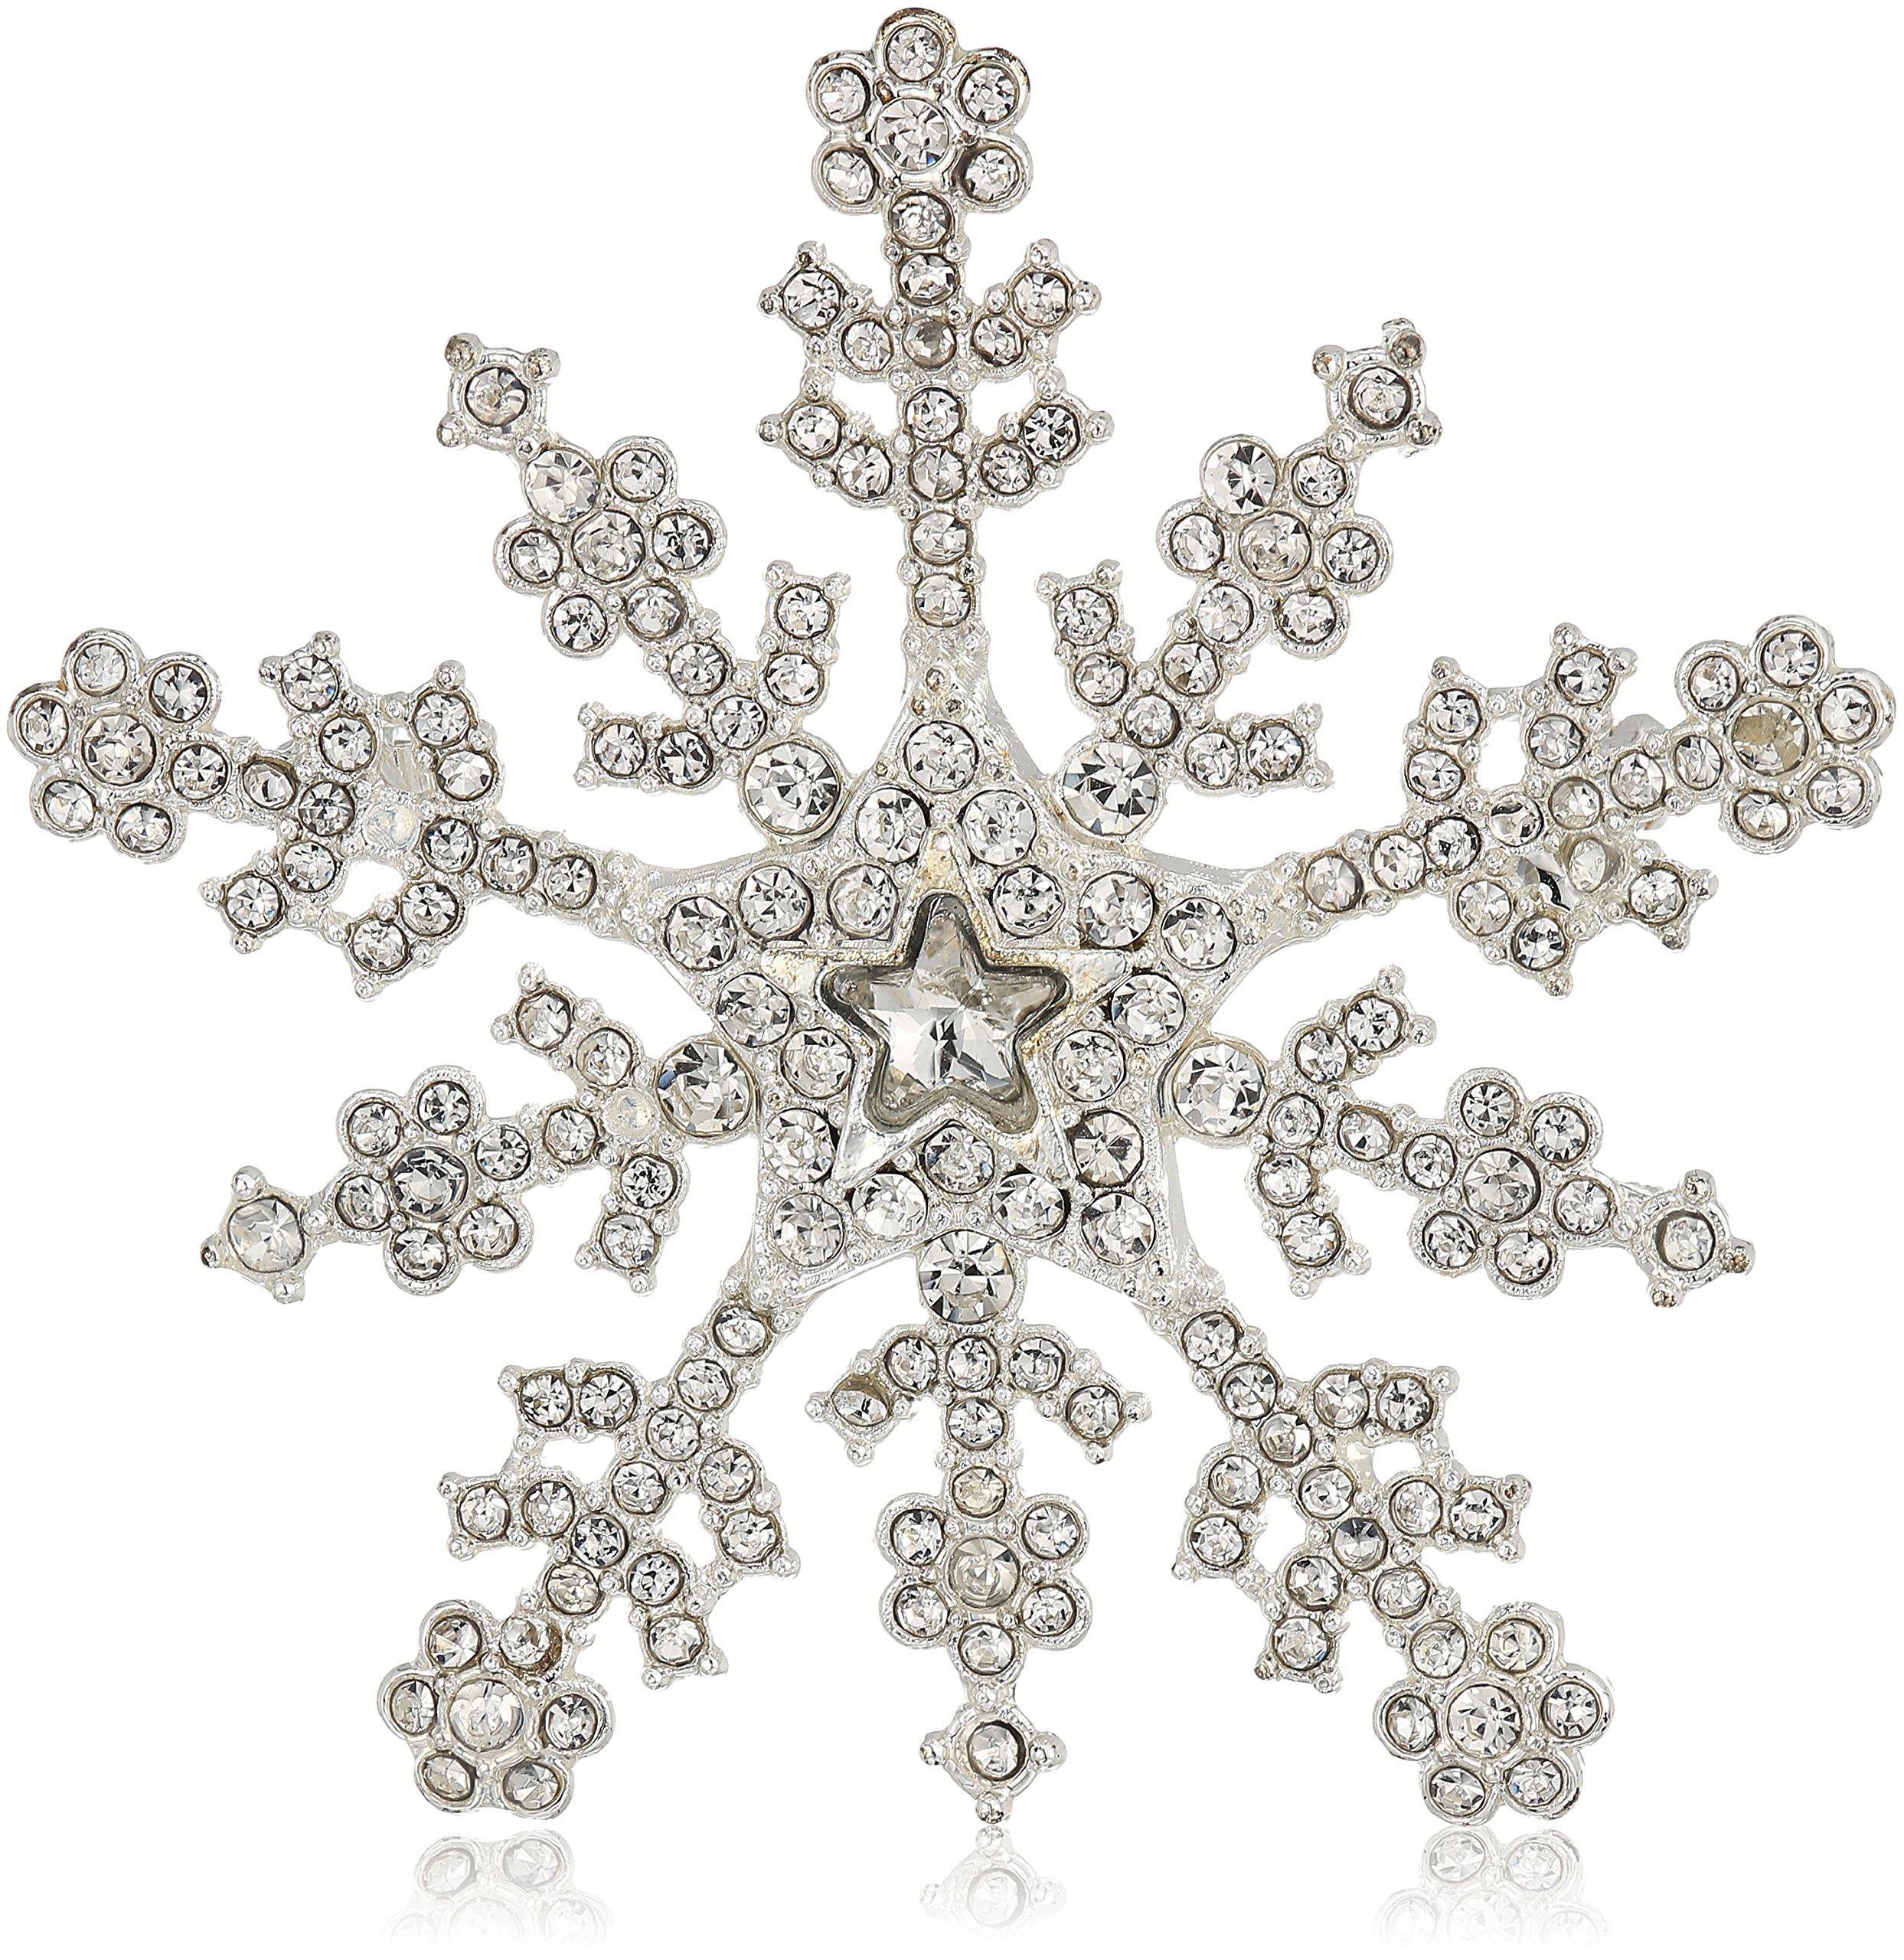 Napier silver-tone and crystal snowflake brooch and pin